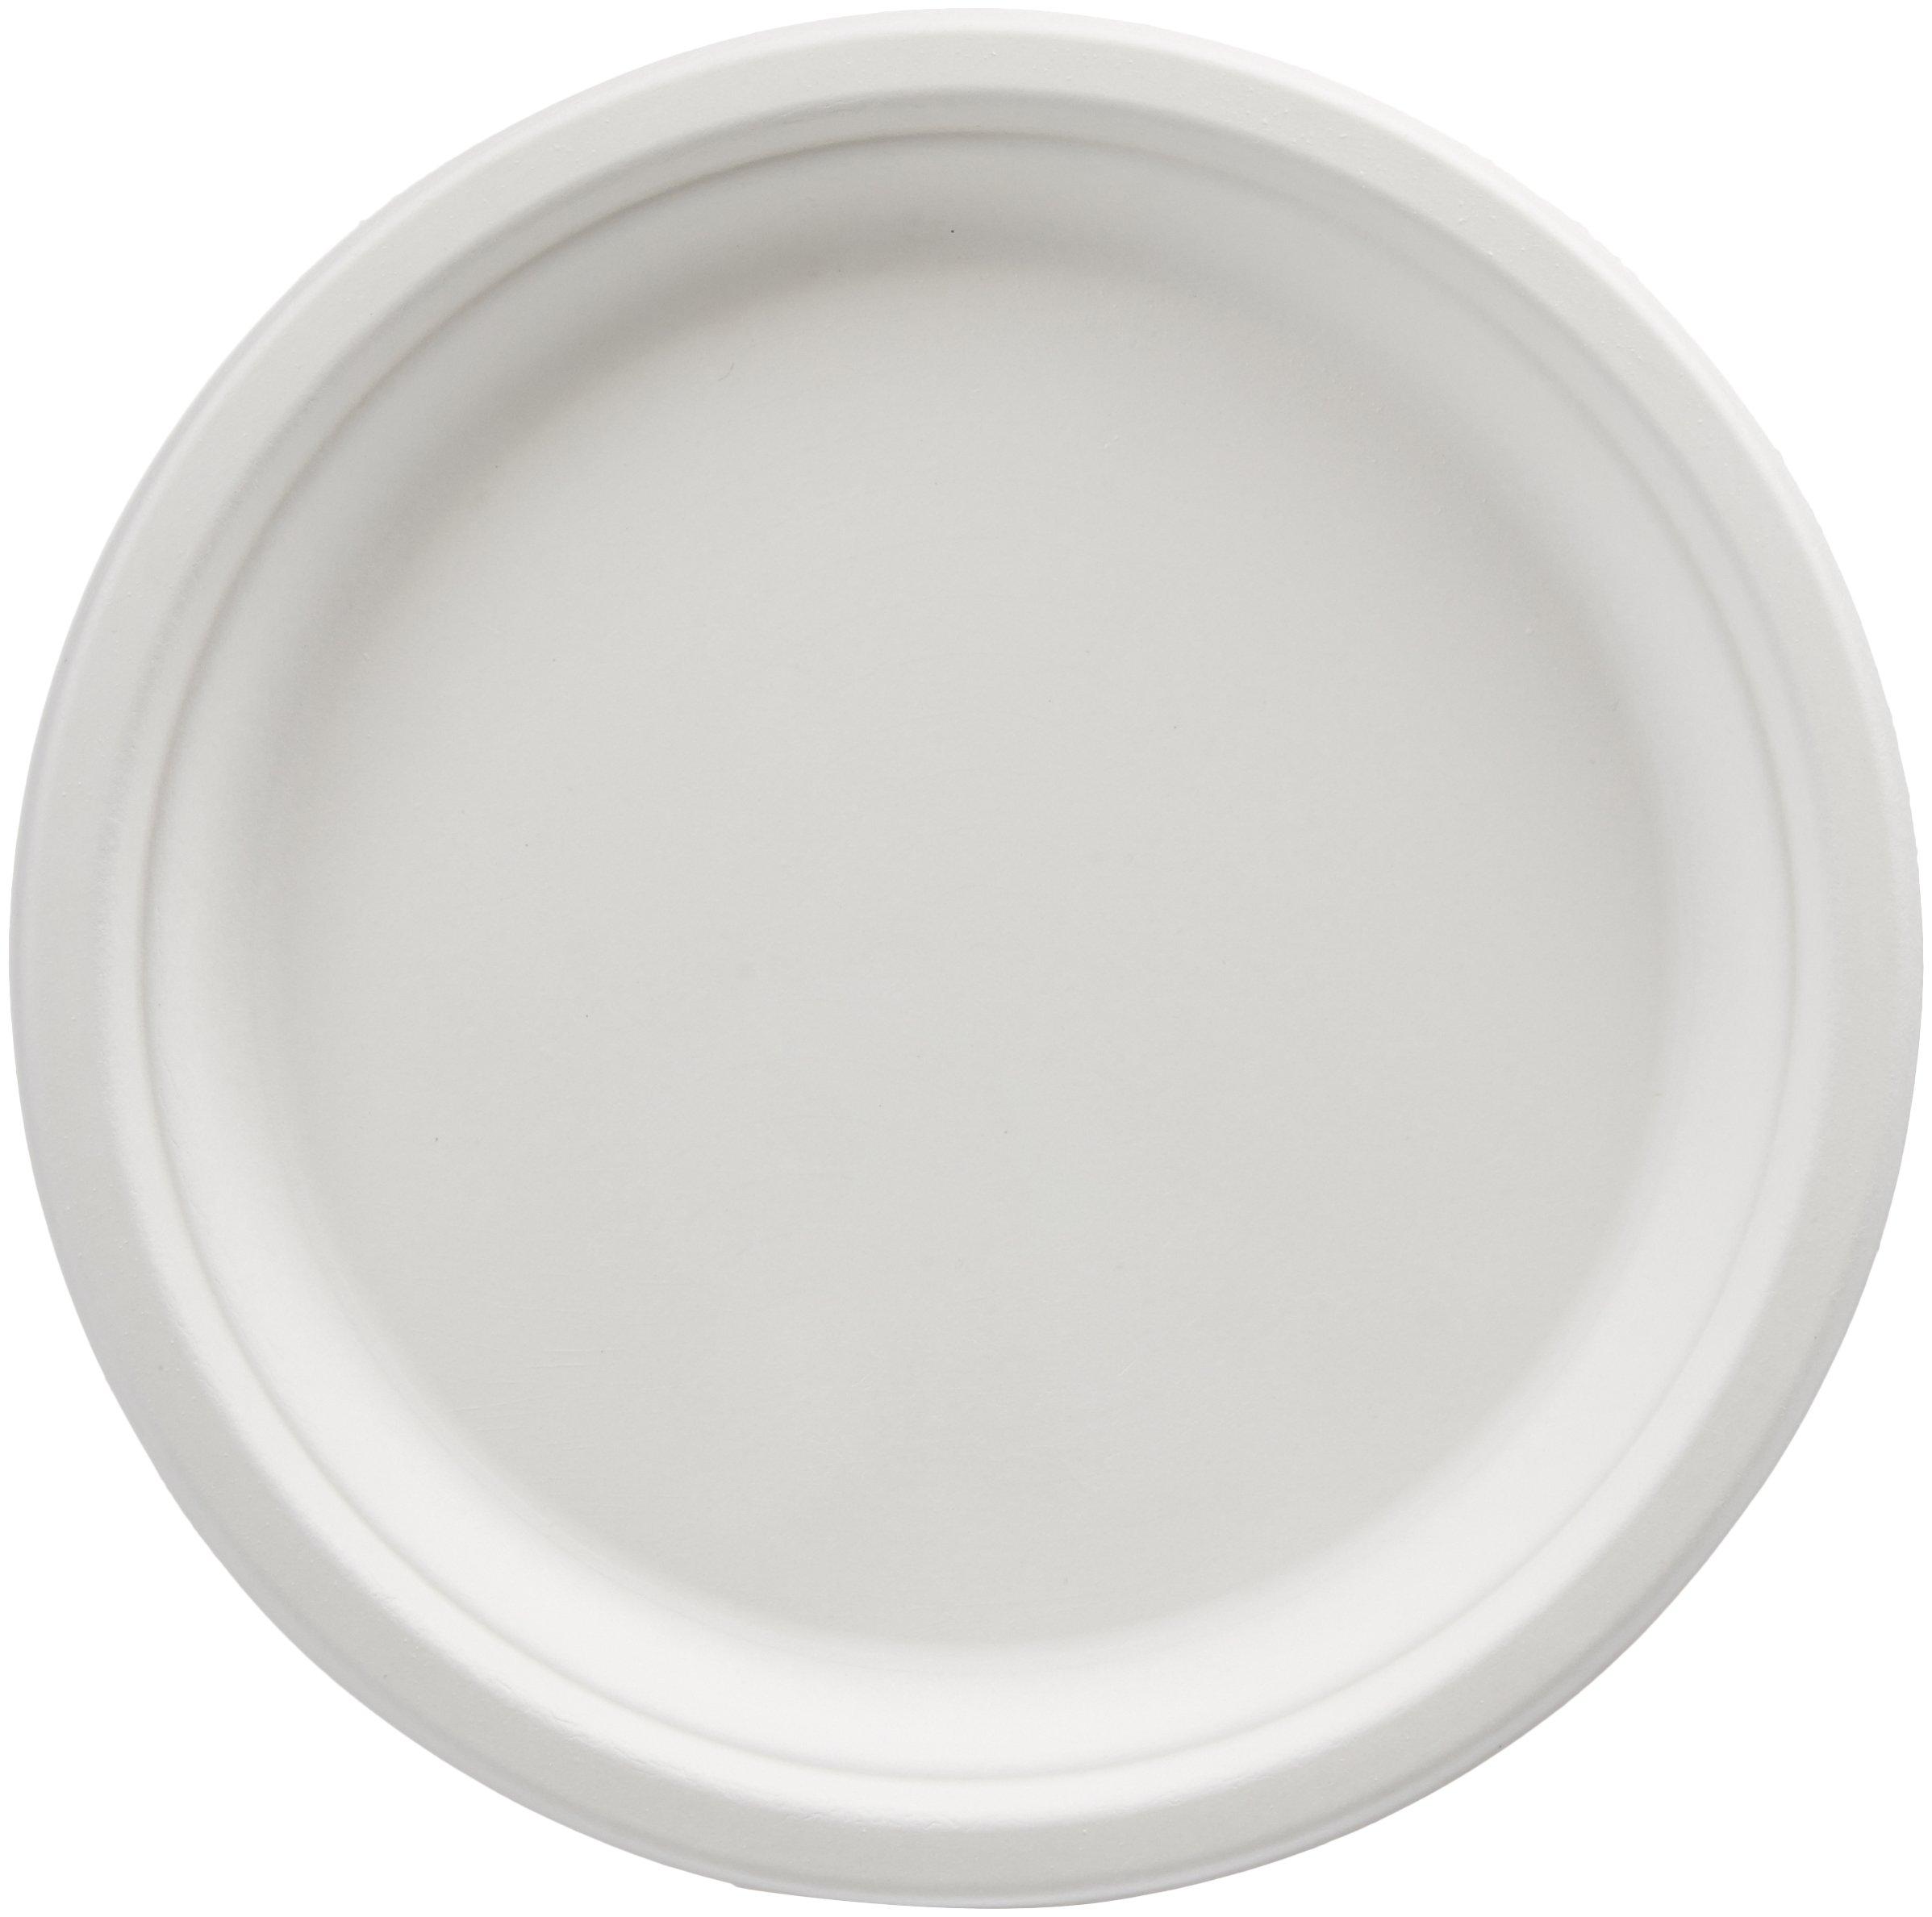 AmazonBasics Compostable Plates, 10-Inch, 500-Count by AmazonBasics